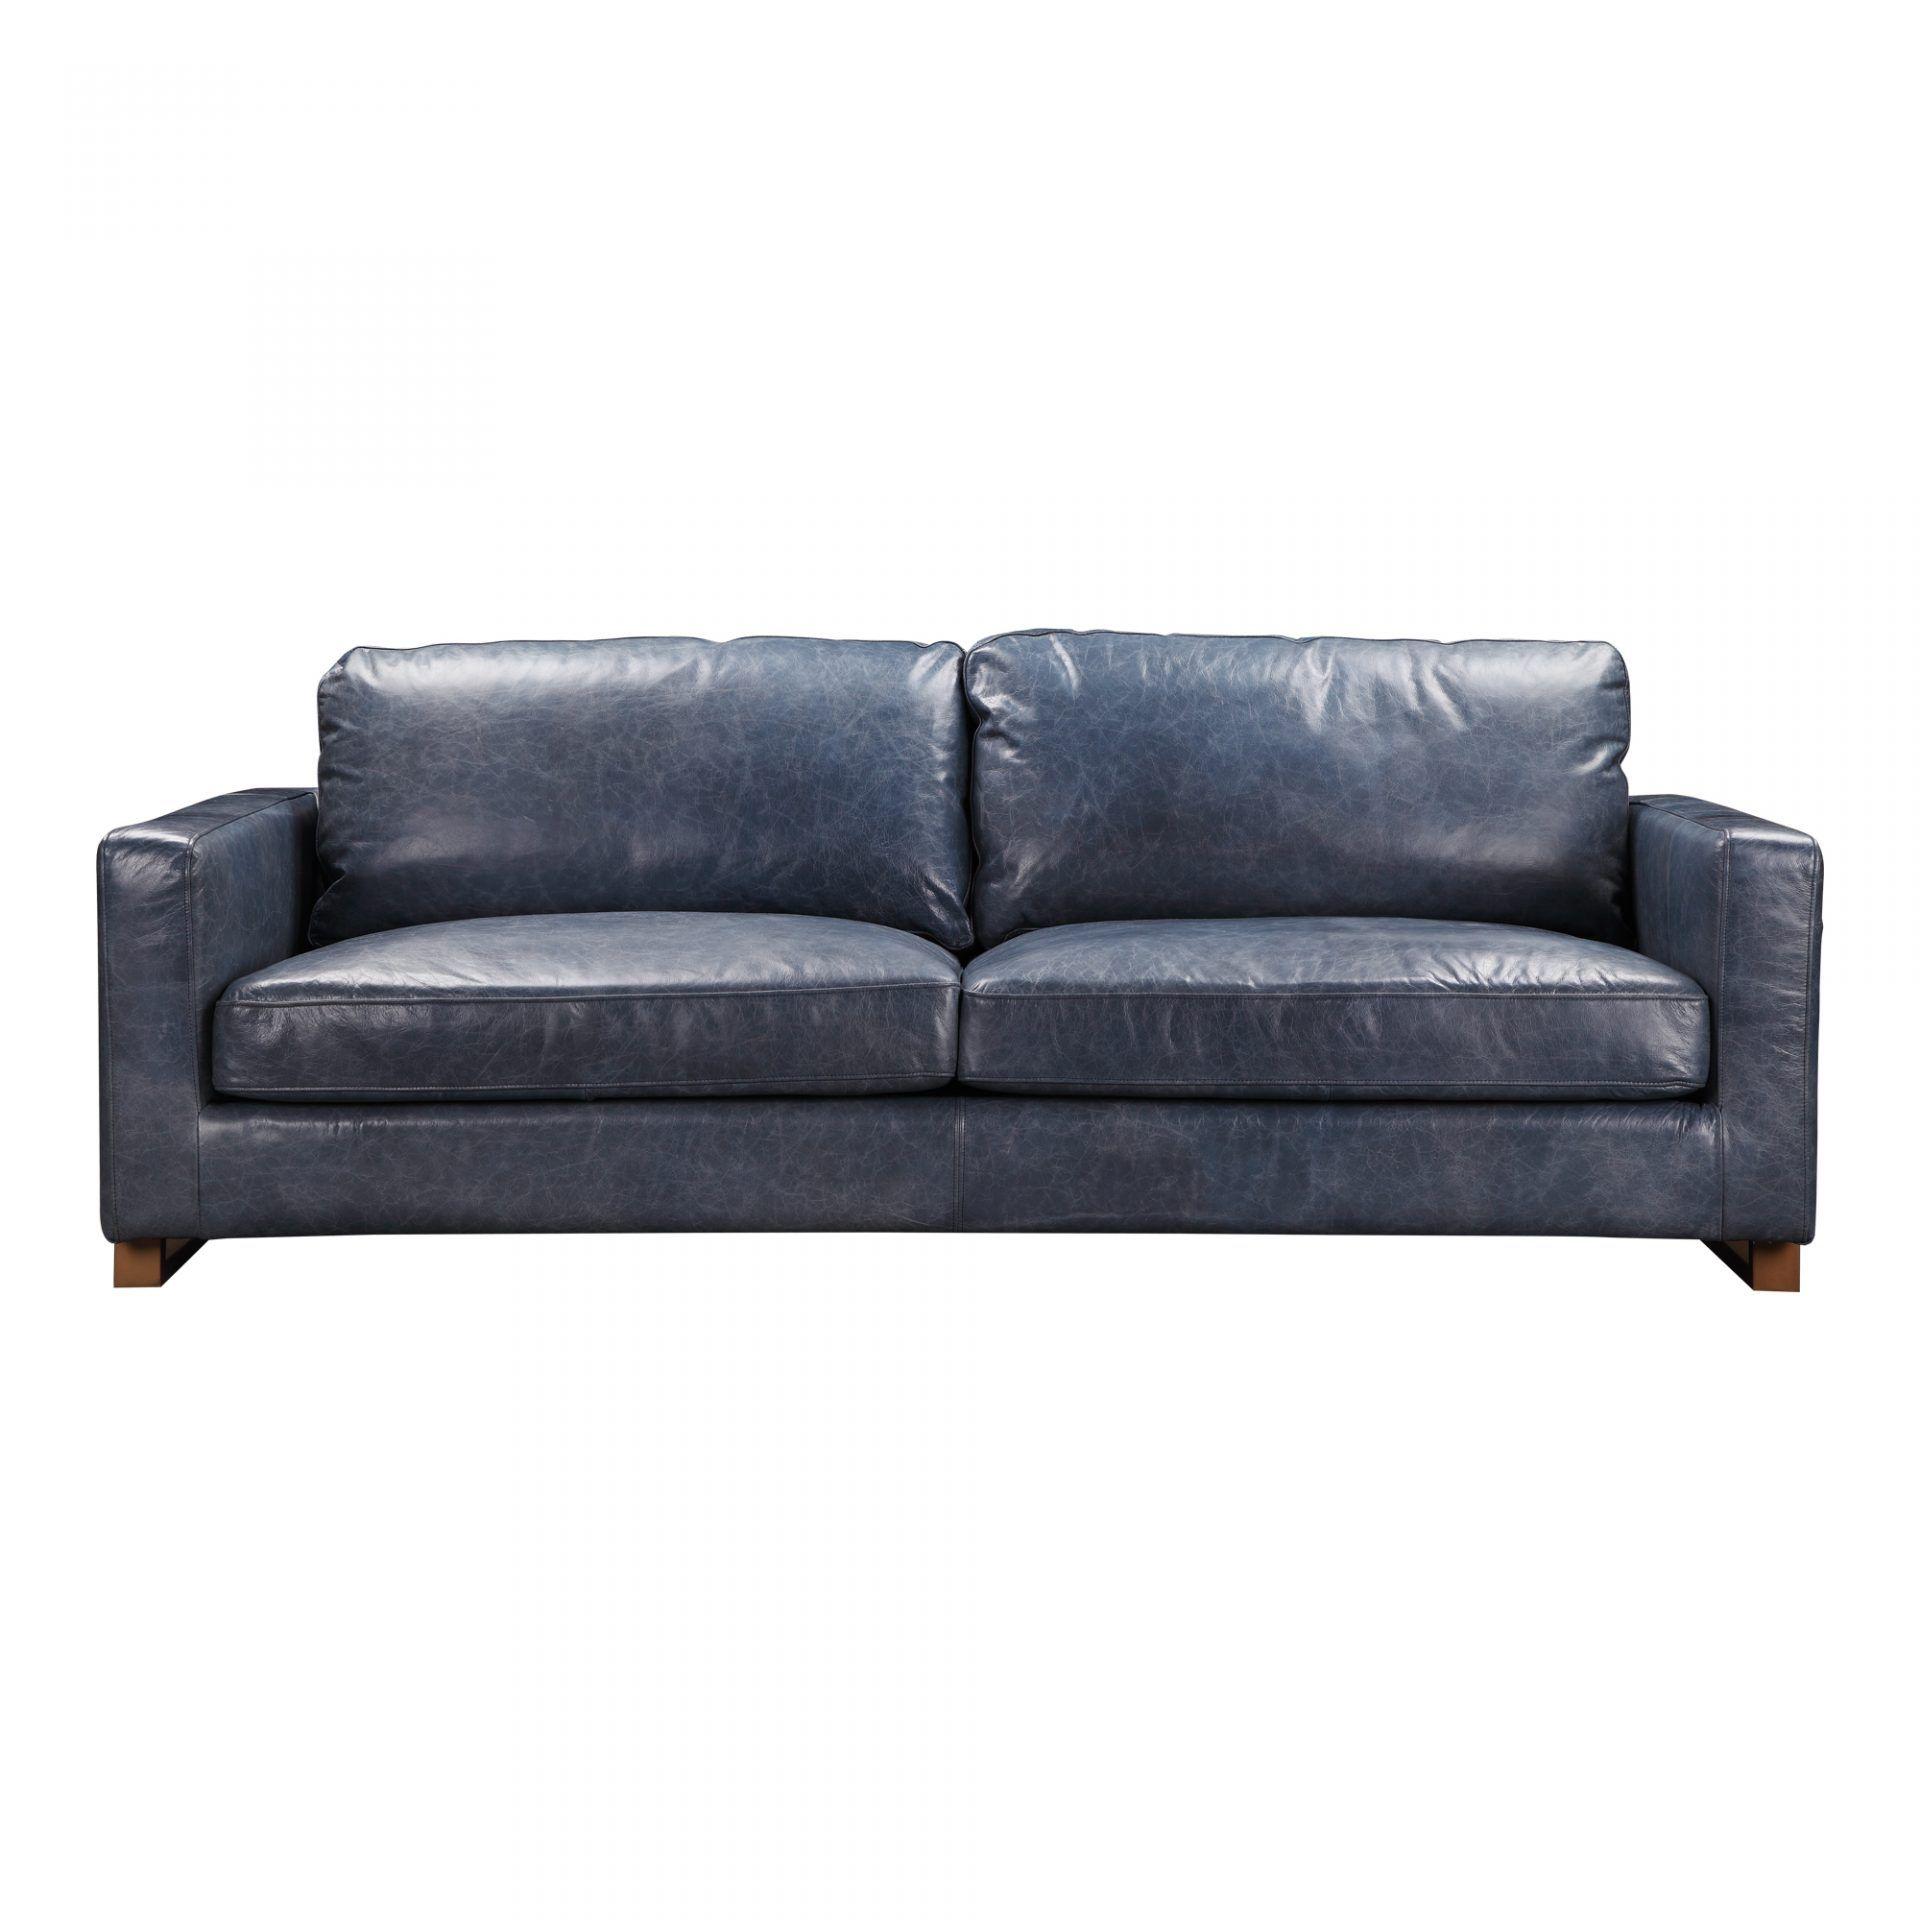 Nikoly Sofa Sofas Moe S Wholesale Sofa Modern Couch Modern